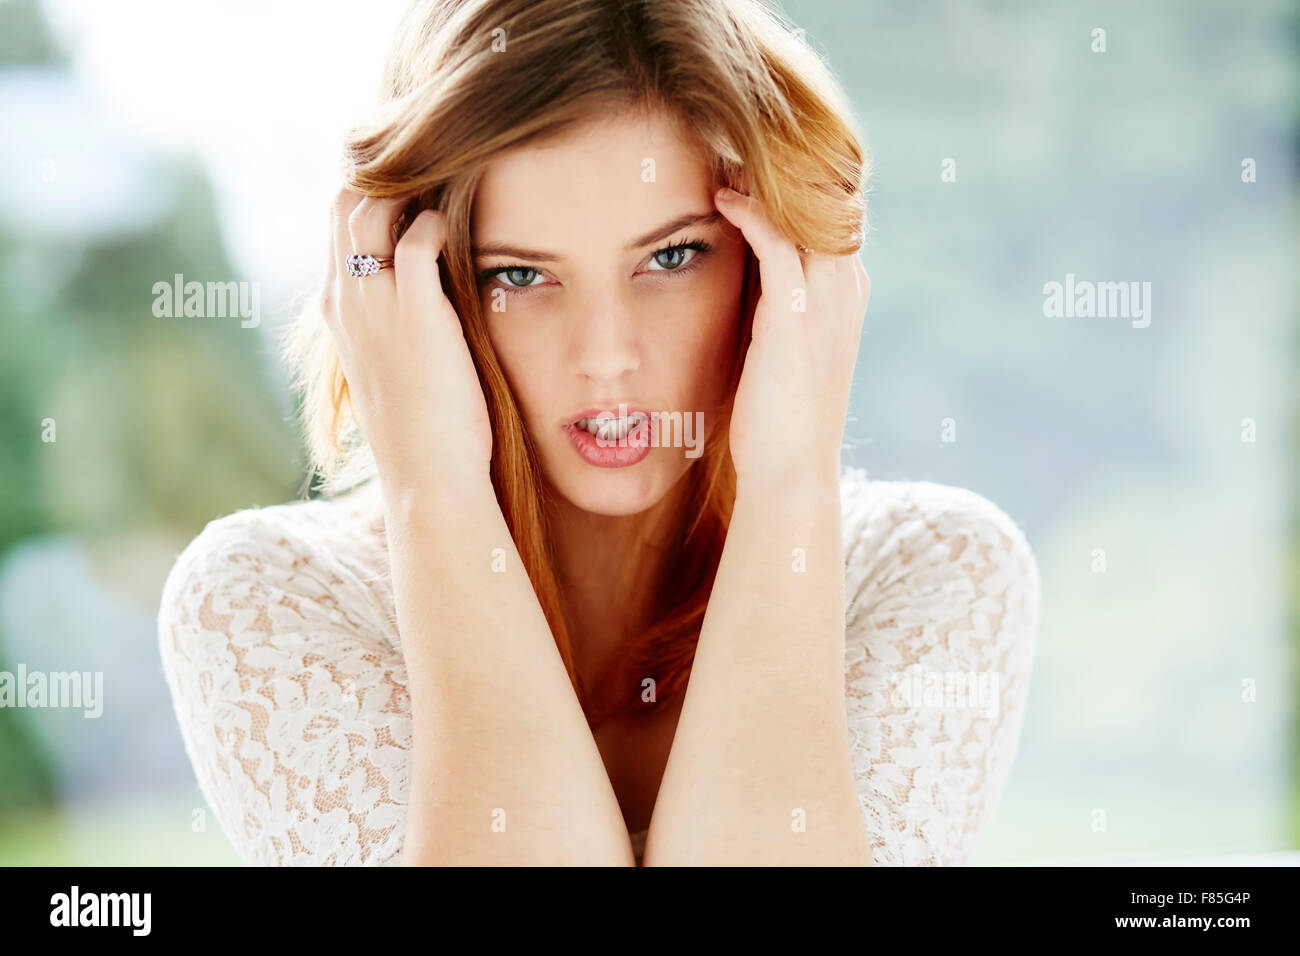 Sad looking girl - Stock Image